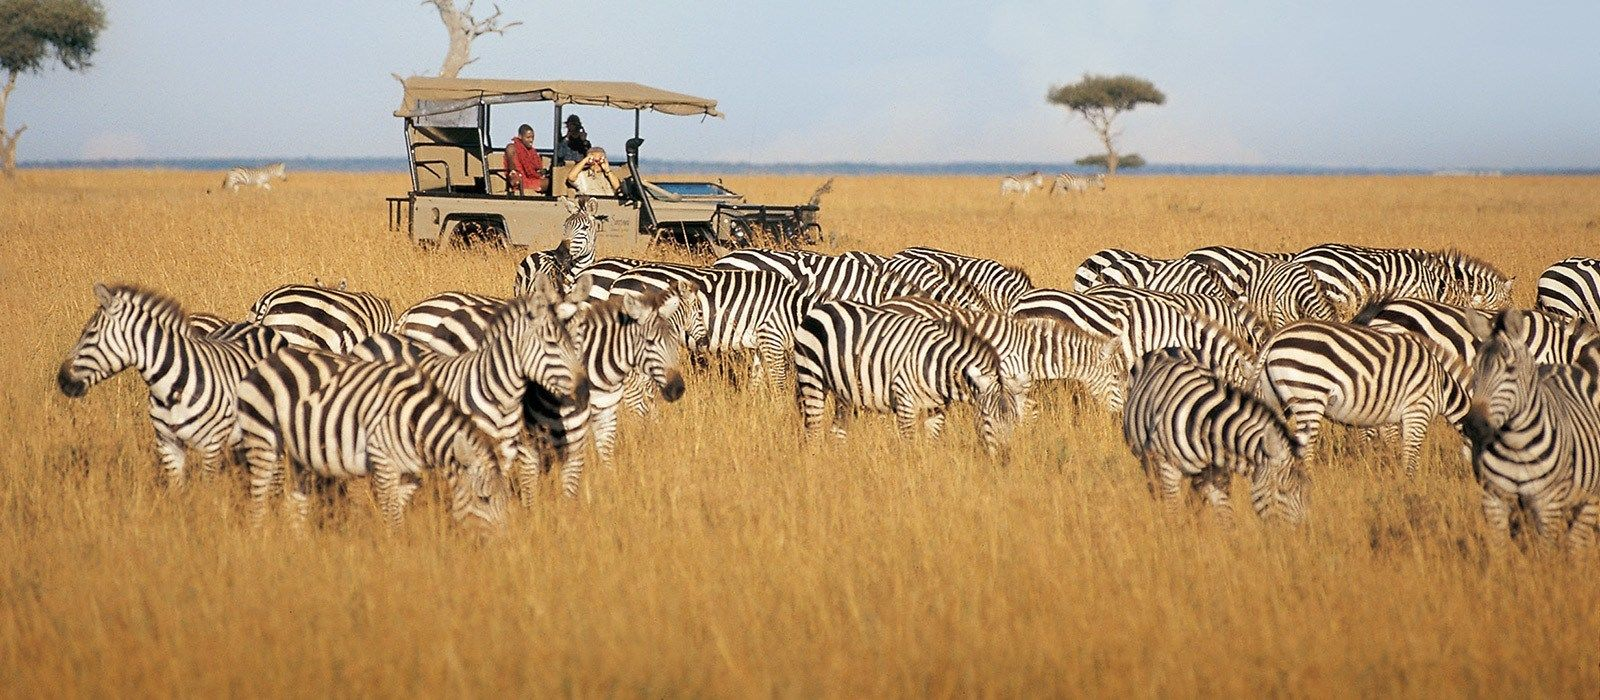 Kenia Hautnah: Safari Höhepunkte Urlaub 5